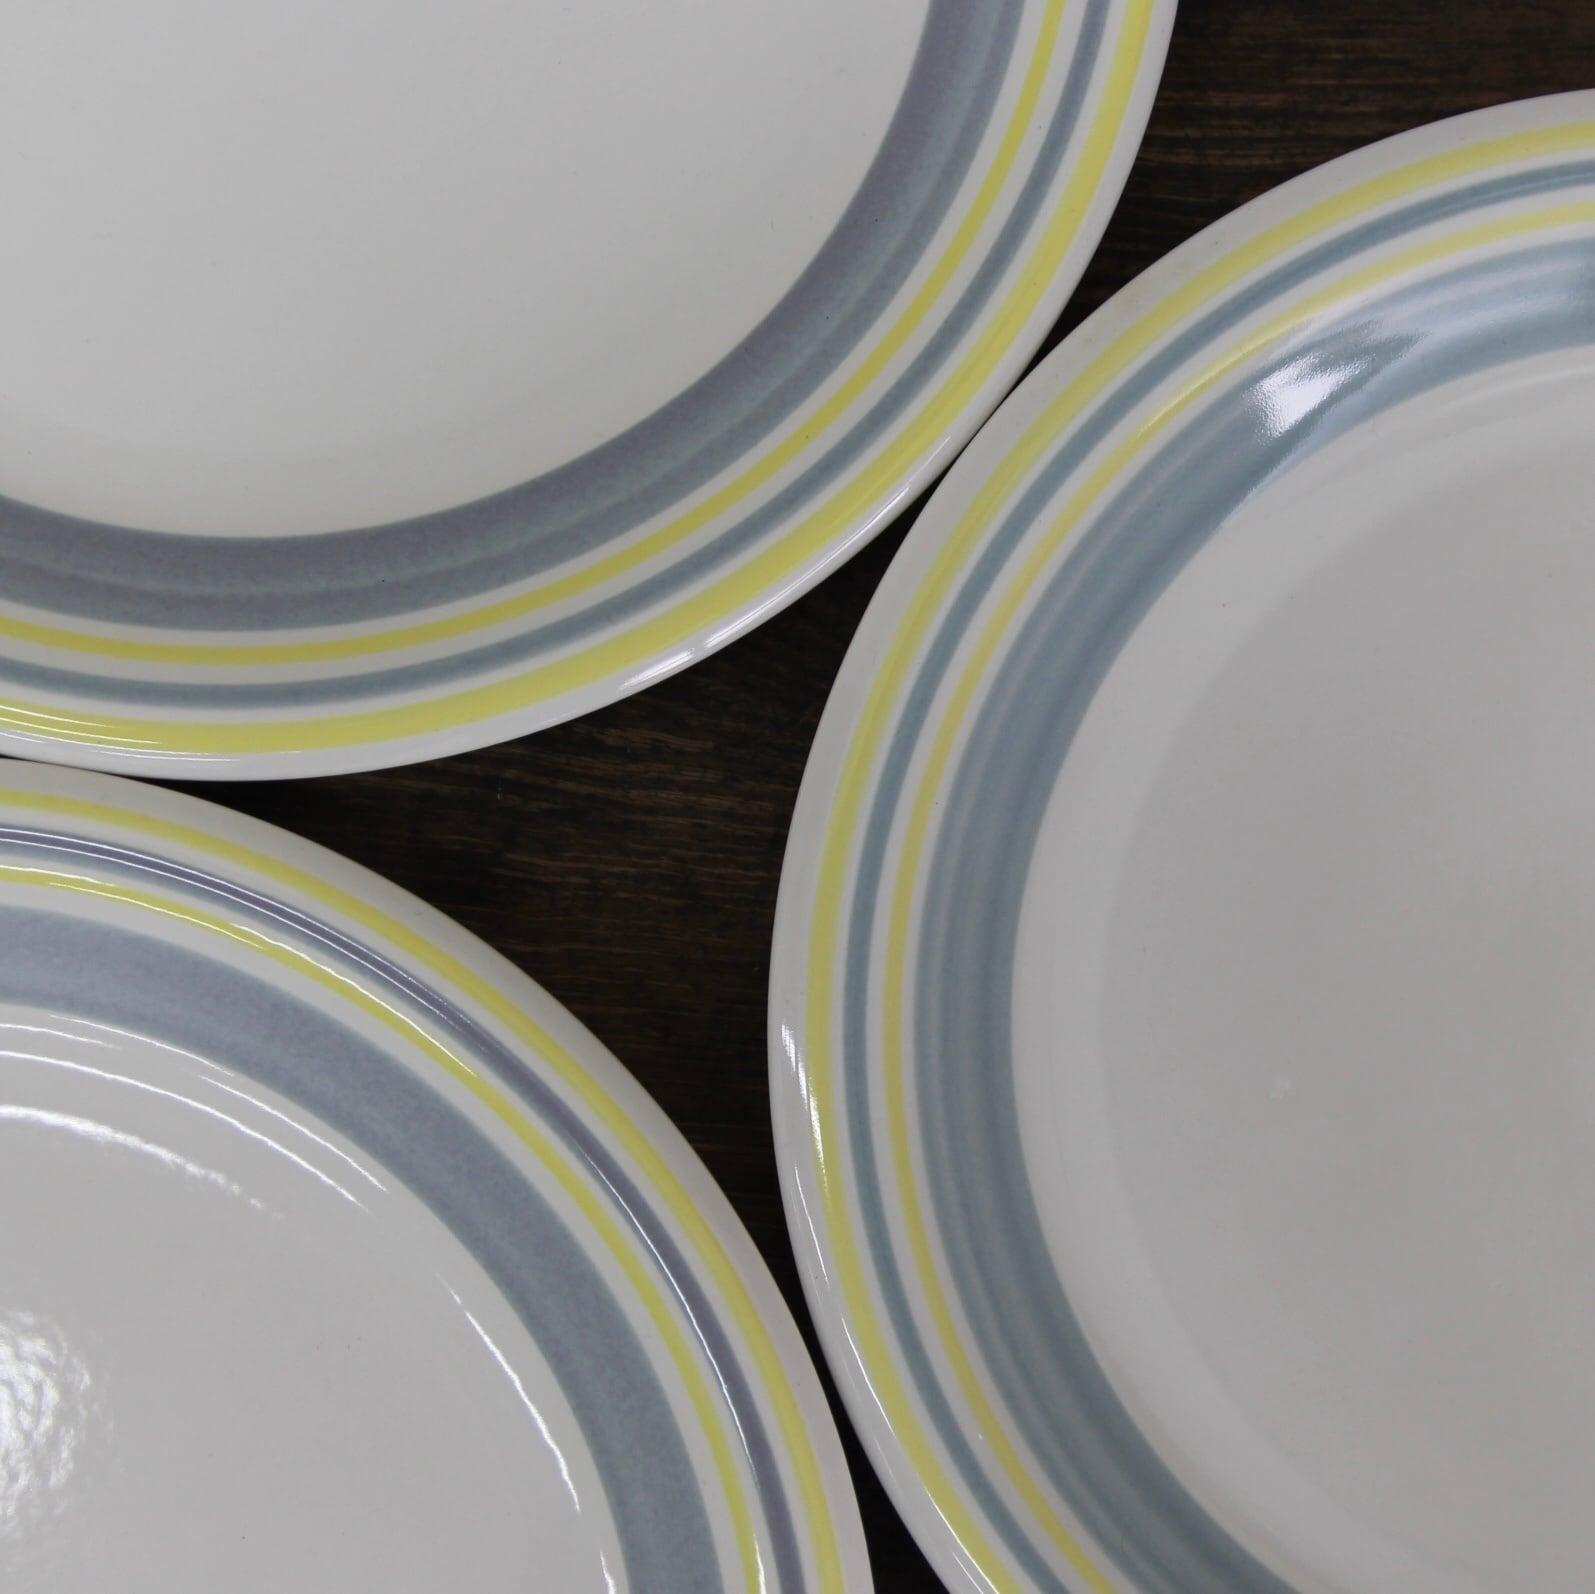 Mount Clemens pottery 淡色リム ストーンウェア 在庫3枚